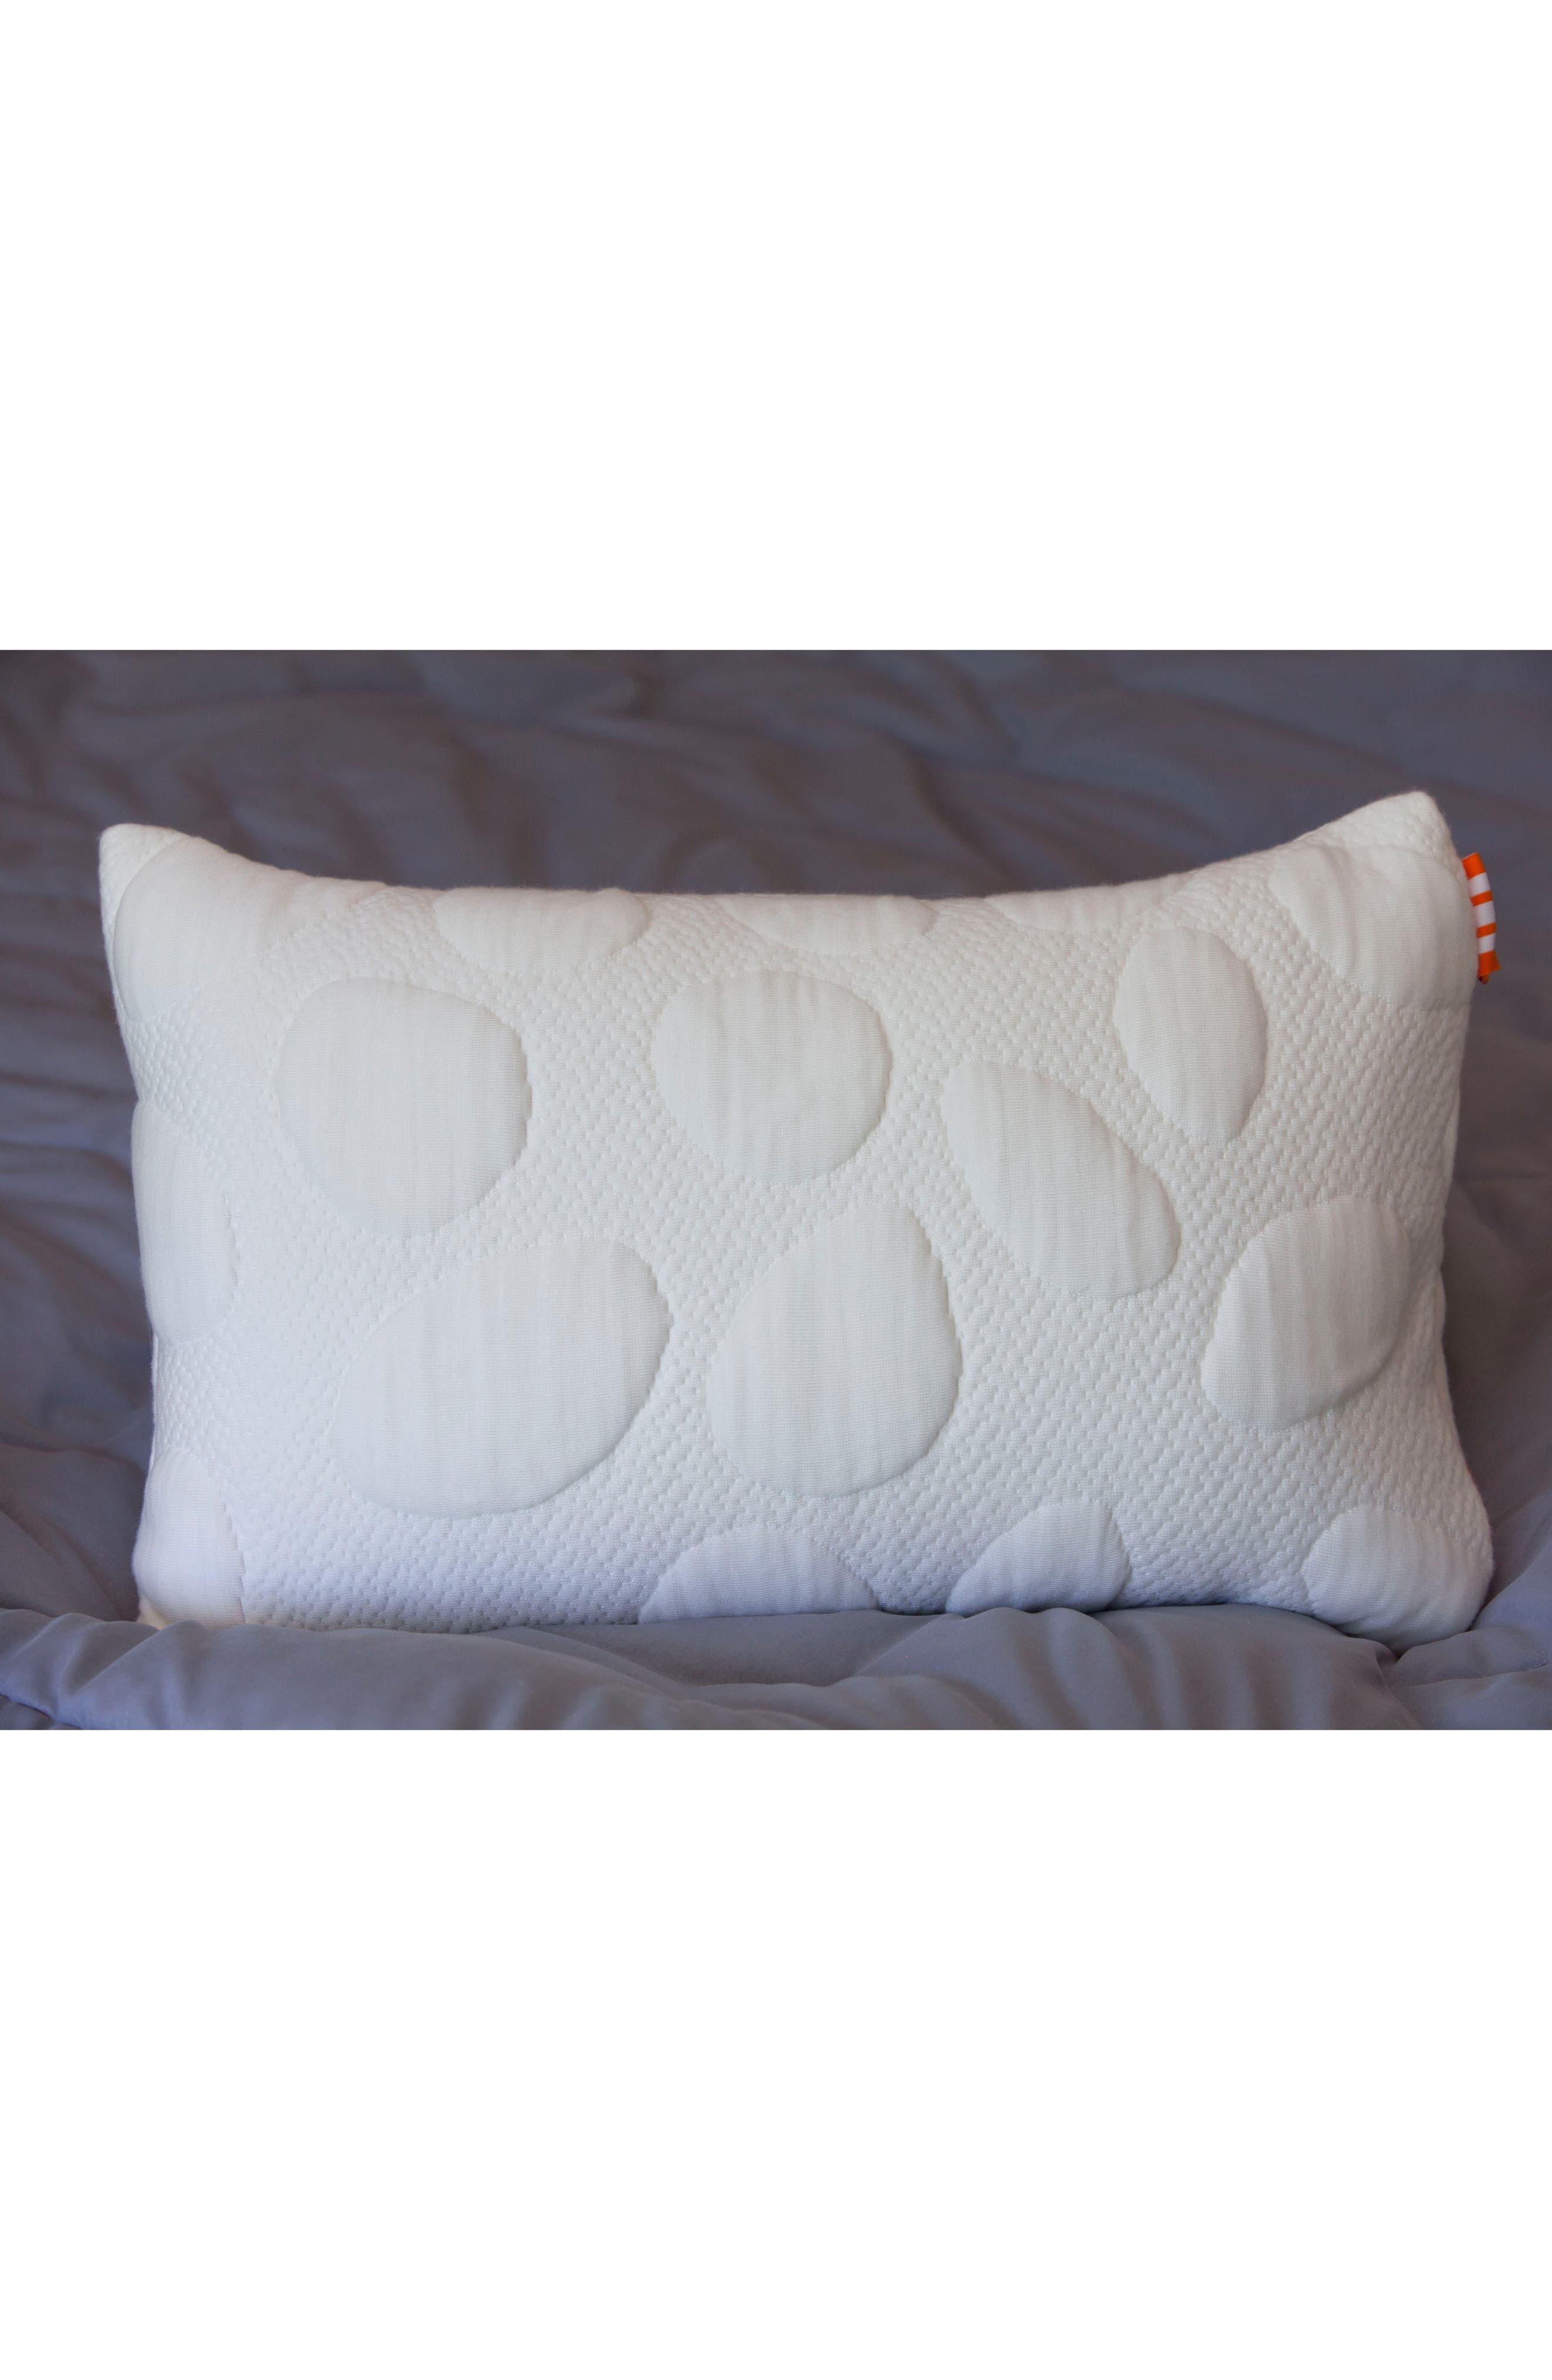 NOOK SLEEP SYSTEMS,                             Nook Pebble Jr. Pillow,                             Alternate thumbnail 2, color,                             100